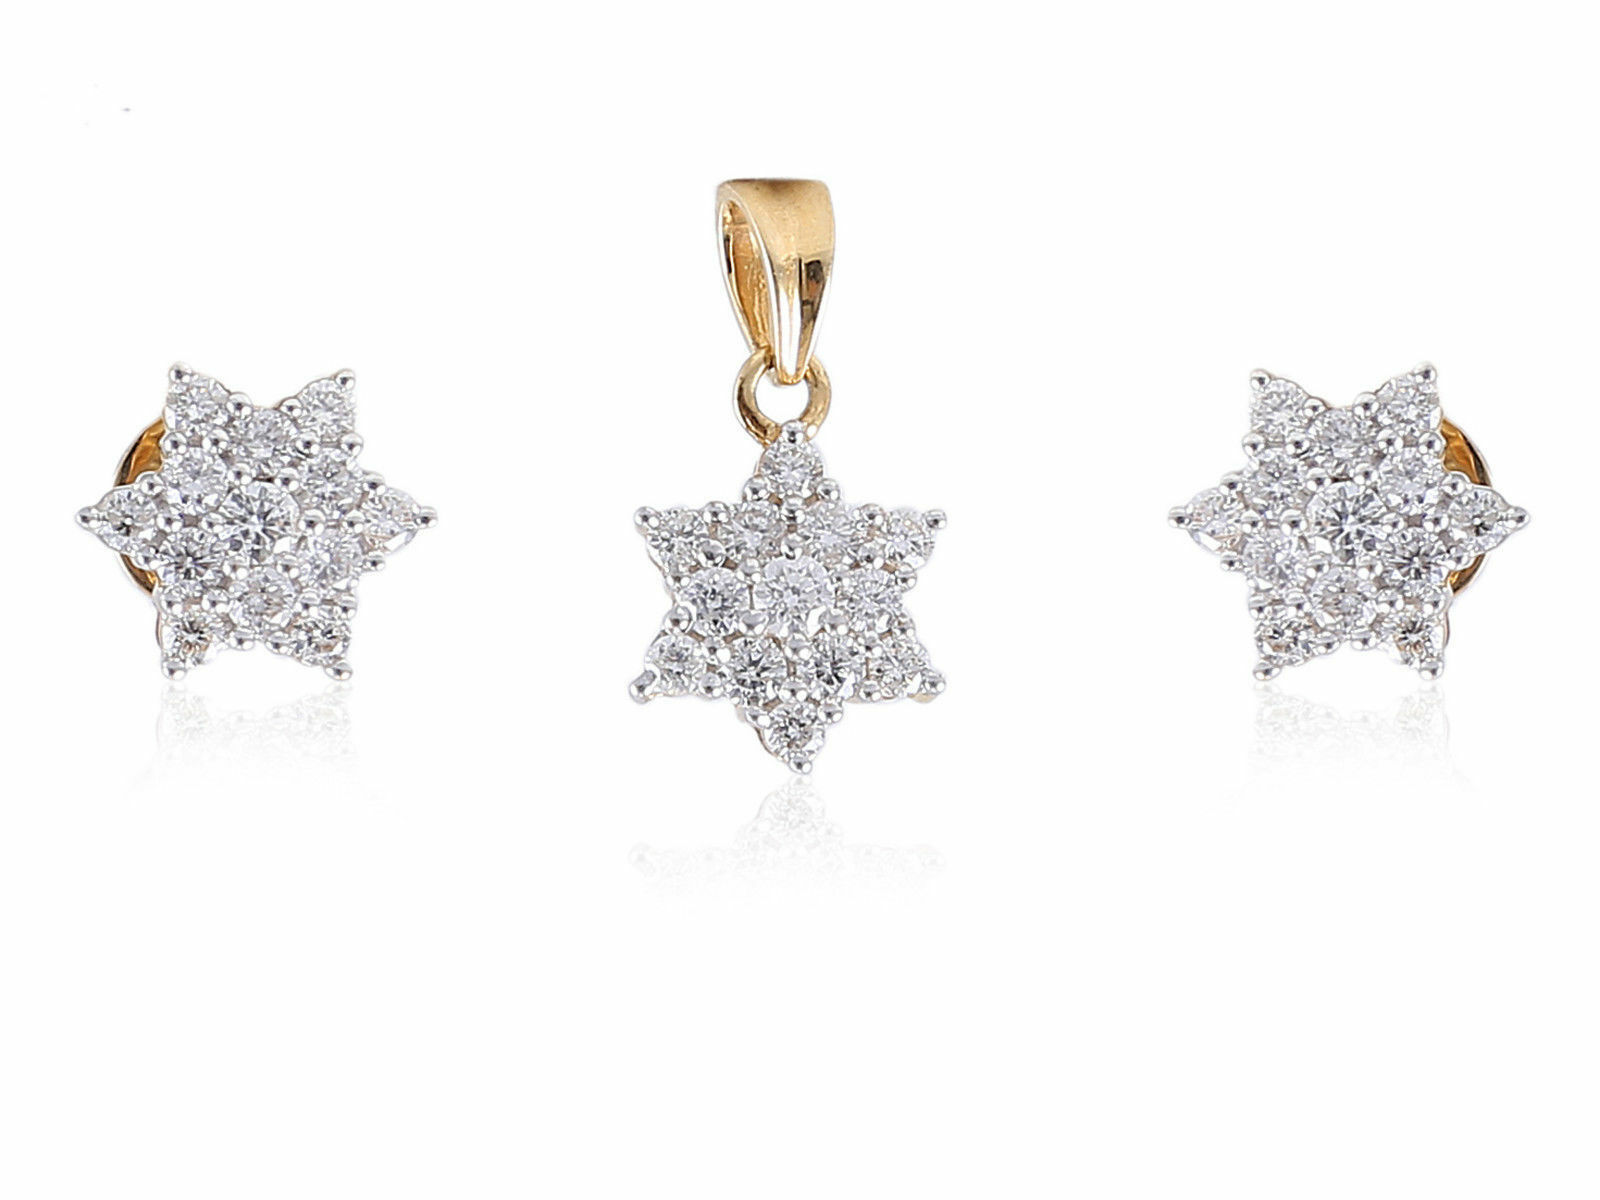 1.12 Cts Round Brilliant Cut Pave Diamonds Pendant Earrings Set In 18Karat gold